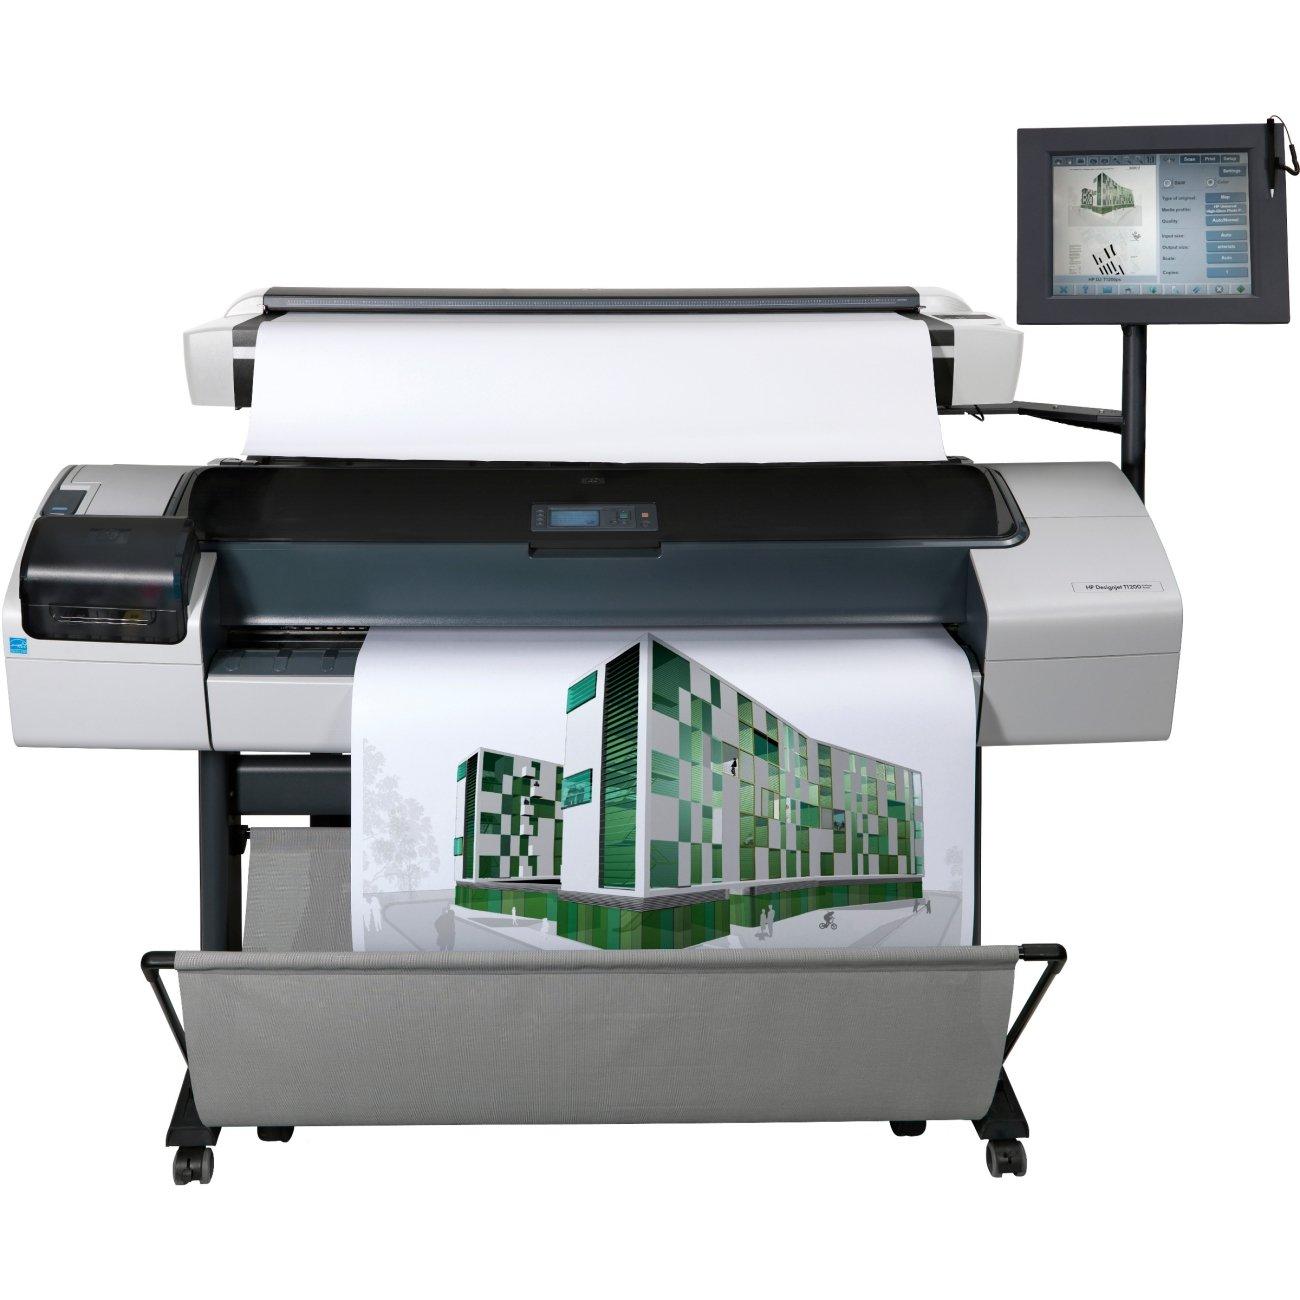 HP Impresora multifunción HP Designjet T1200 HD - Impresora de gran formato (Adobe PostScript® 3, Adobe